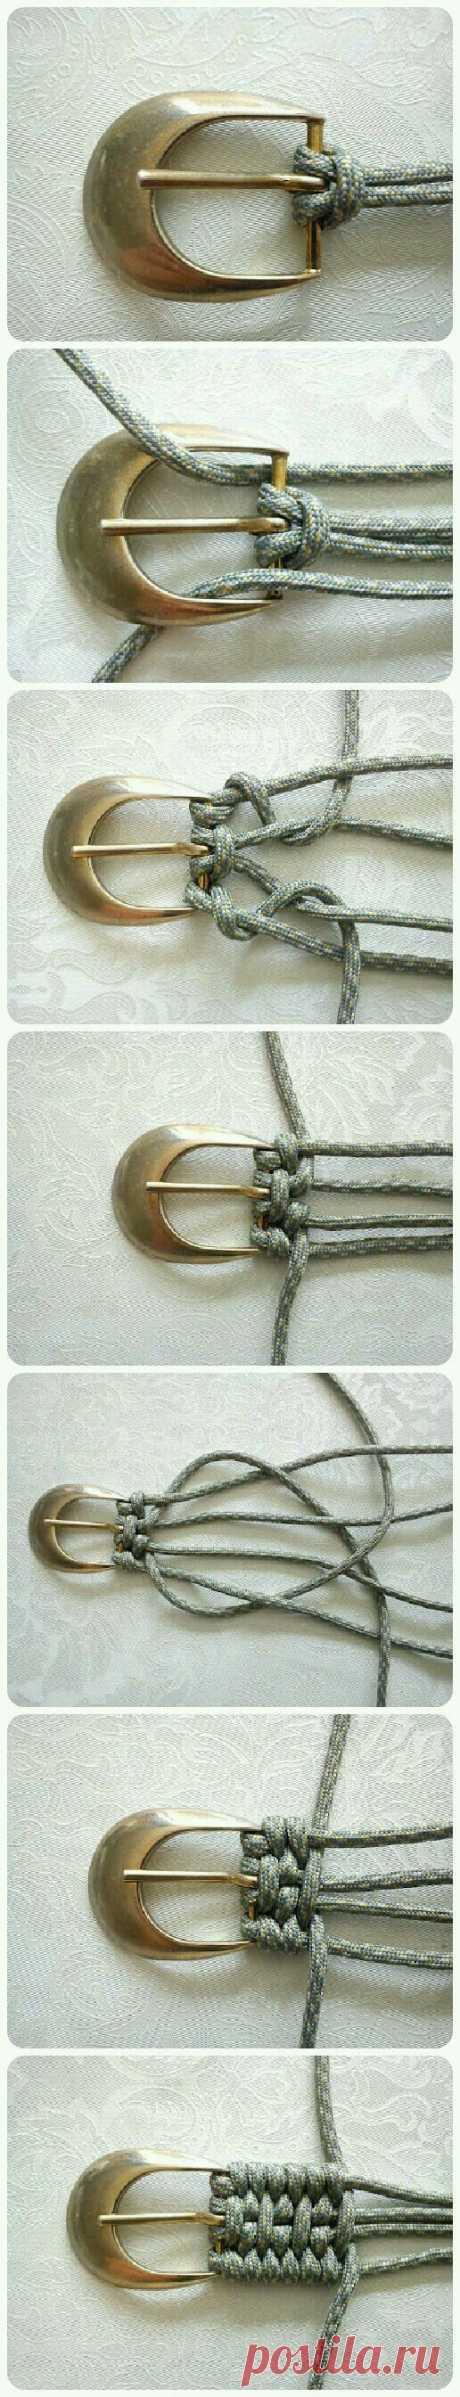 With 550 cord new work belt   Artesanatos&cia